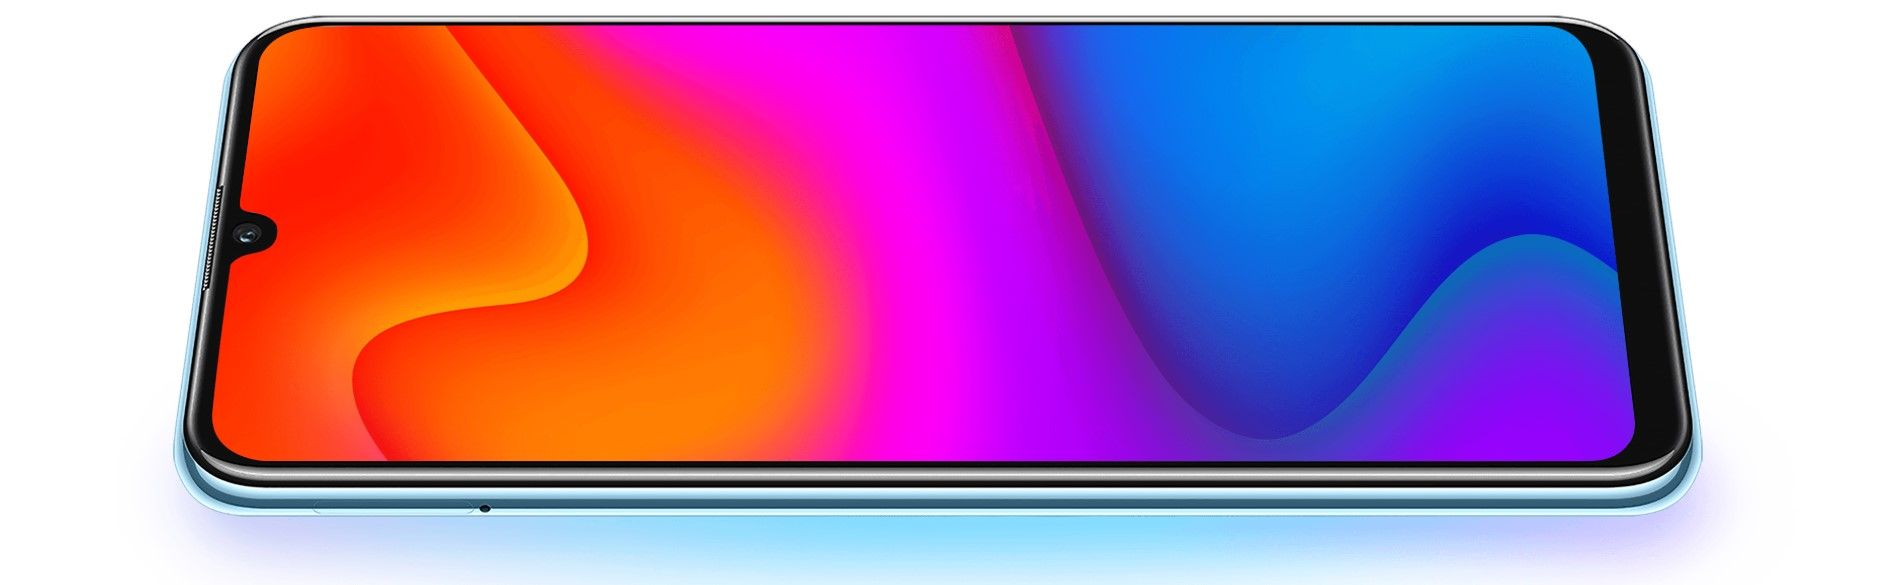 Huawei Y8p дисплей